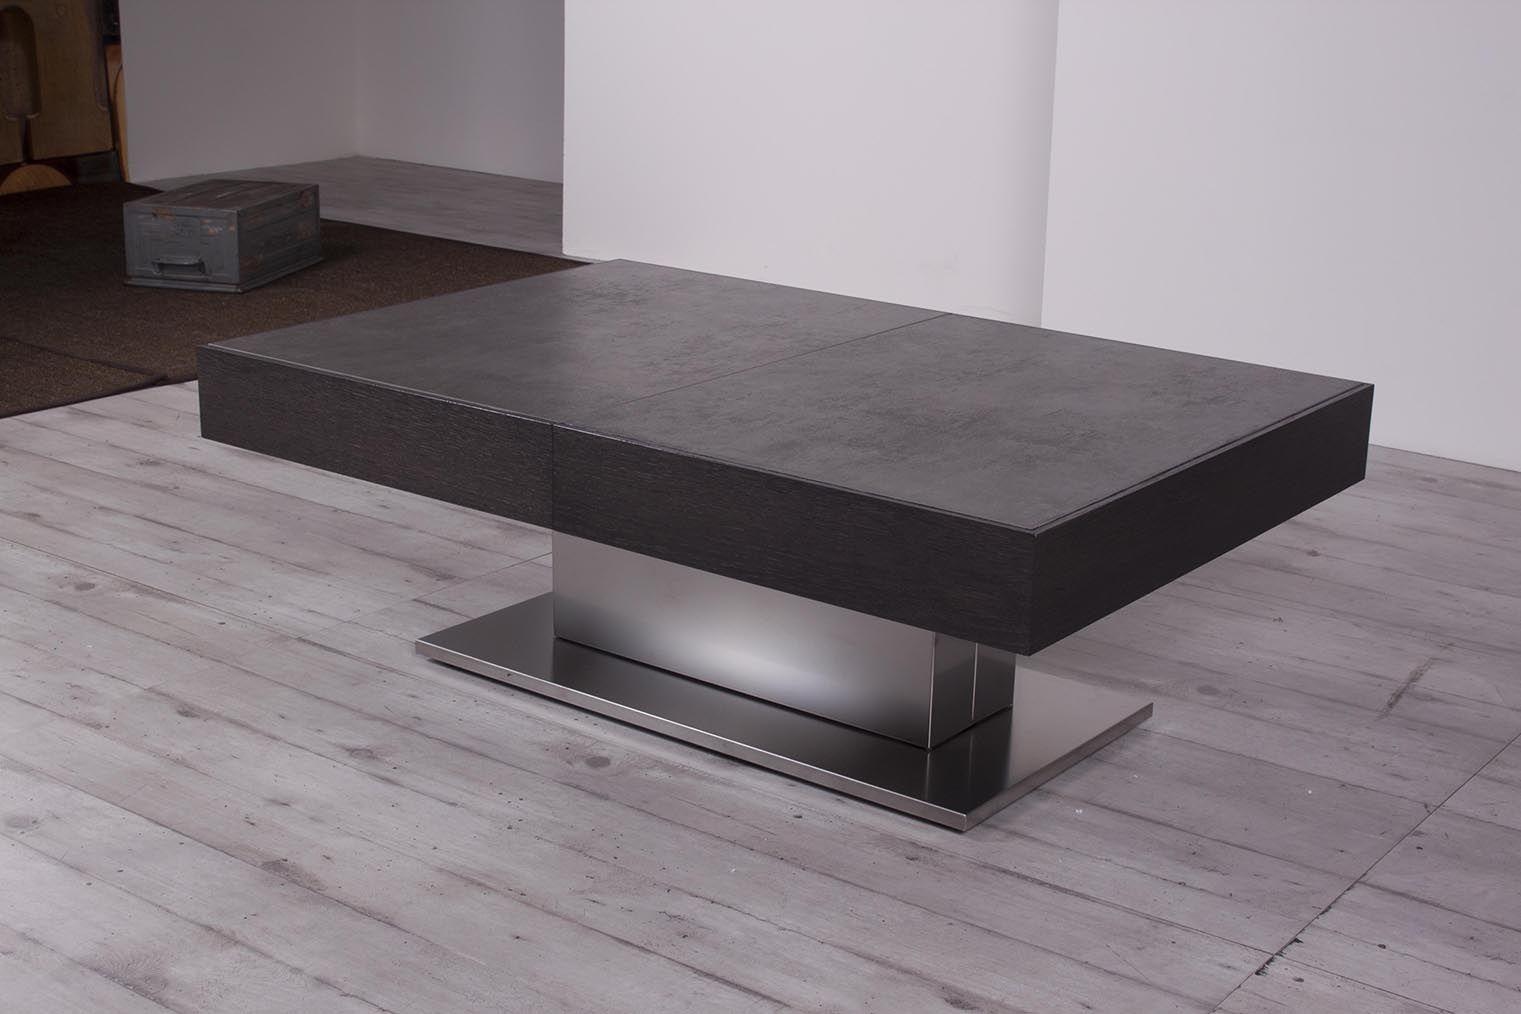 Tavolini trasformabili in tavoli da pranzo | Tavolini ...